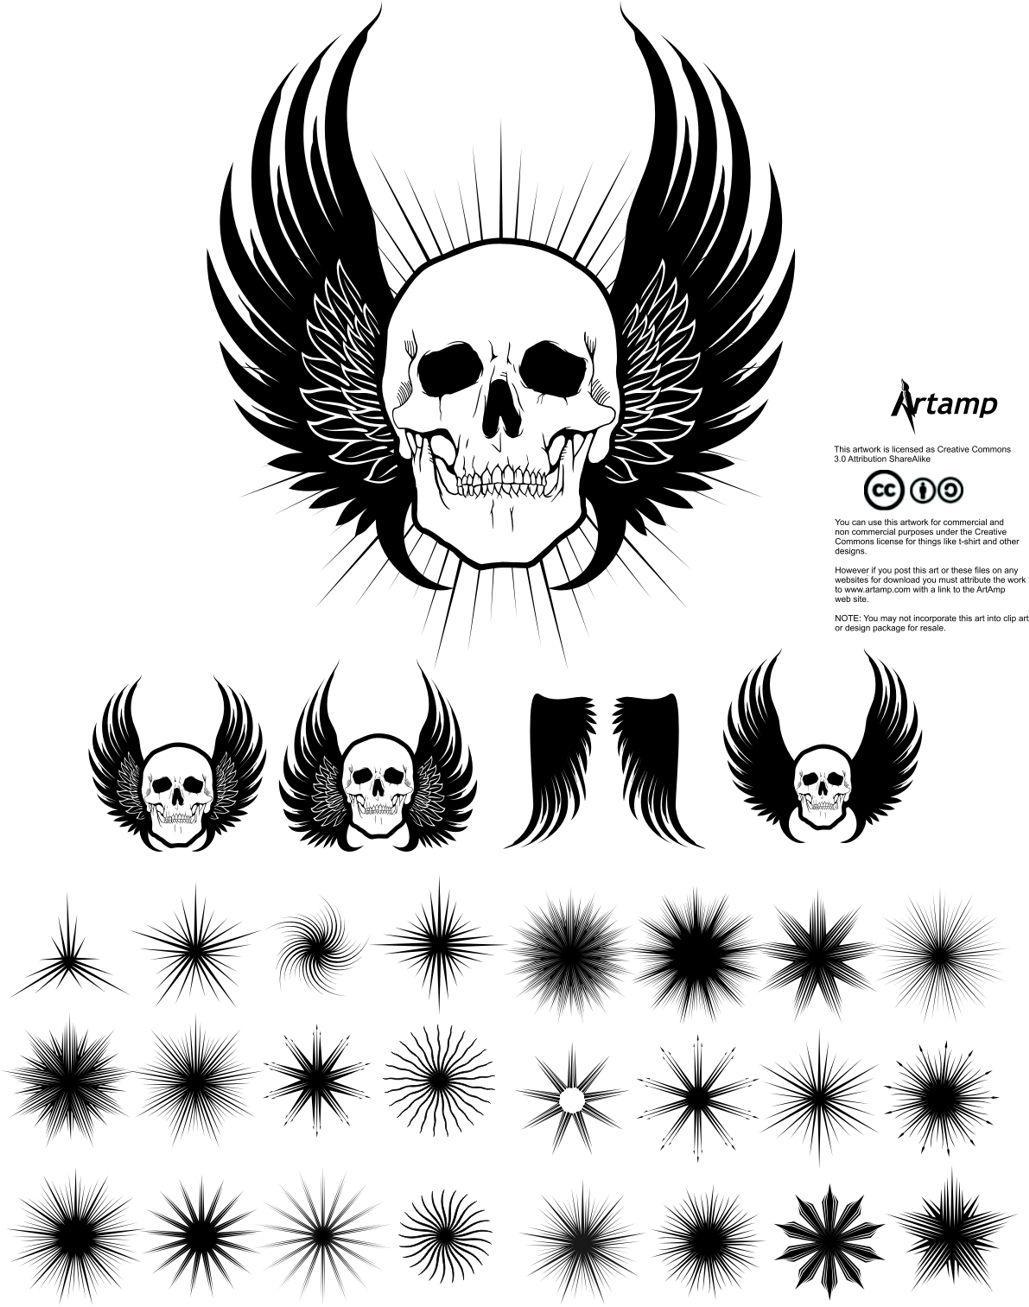 Free Clip Art Pack By Artamp On Deviantart